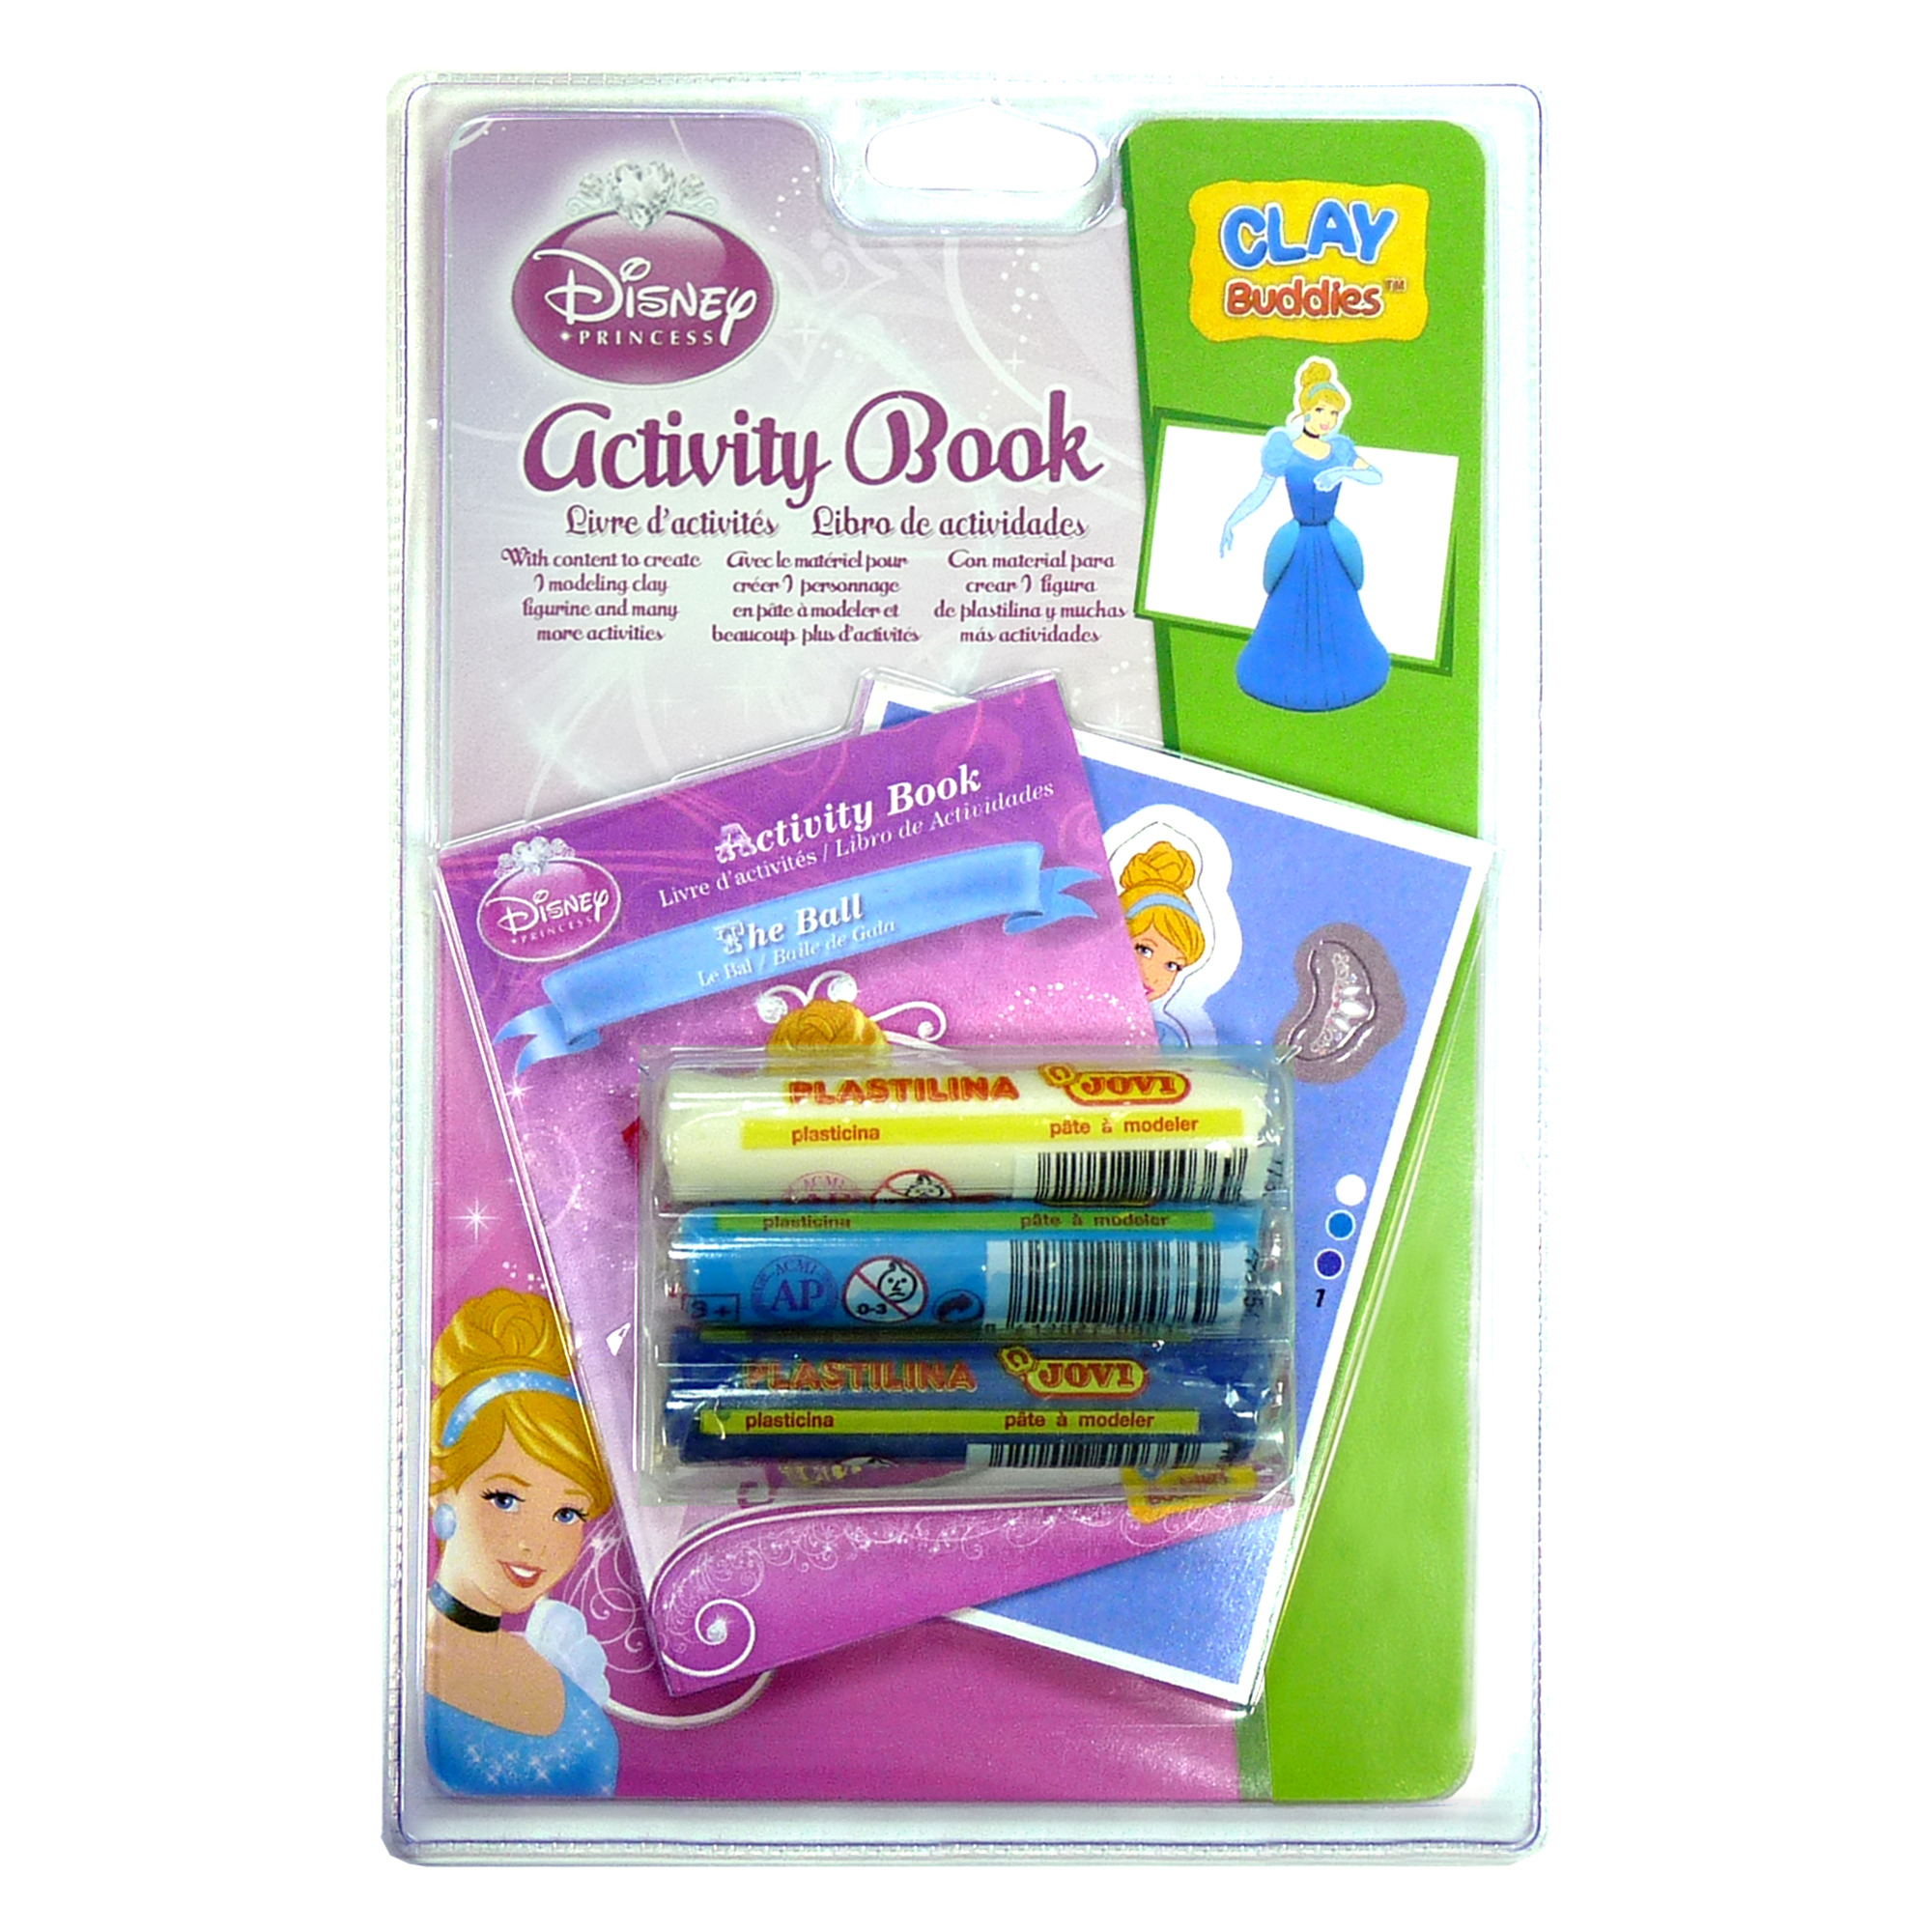 Disney Princess - Clay Buddies Blister Pack - Cinderella